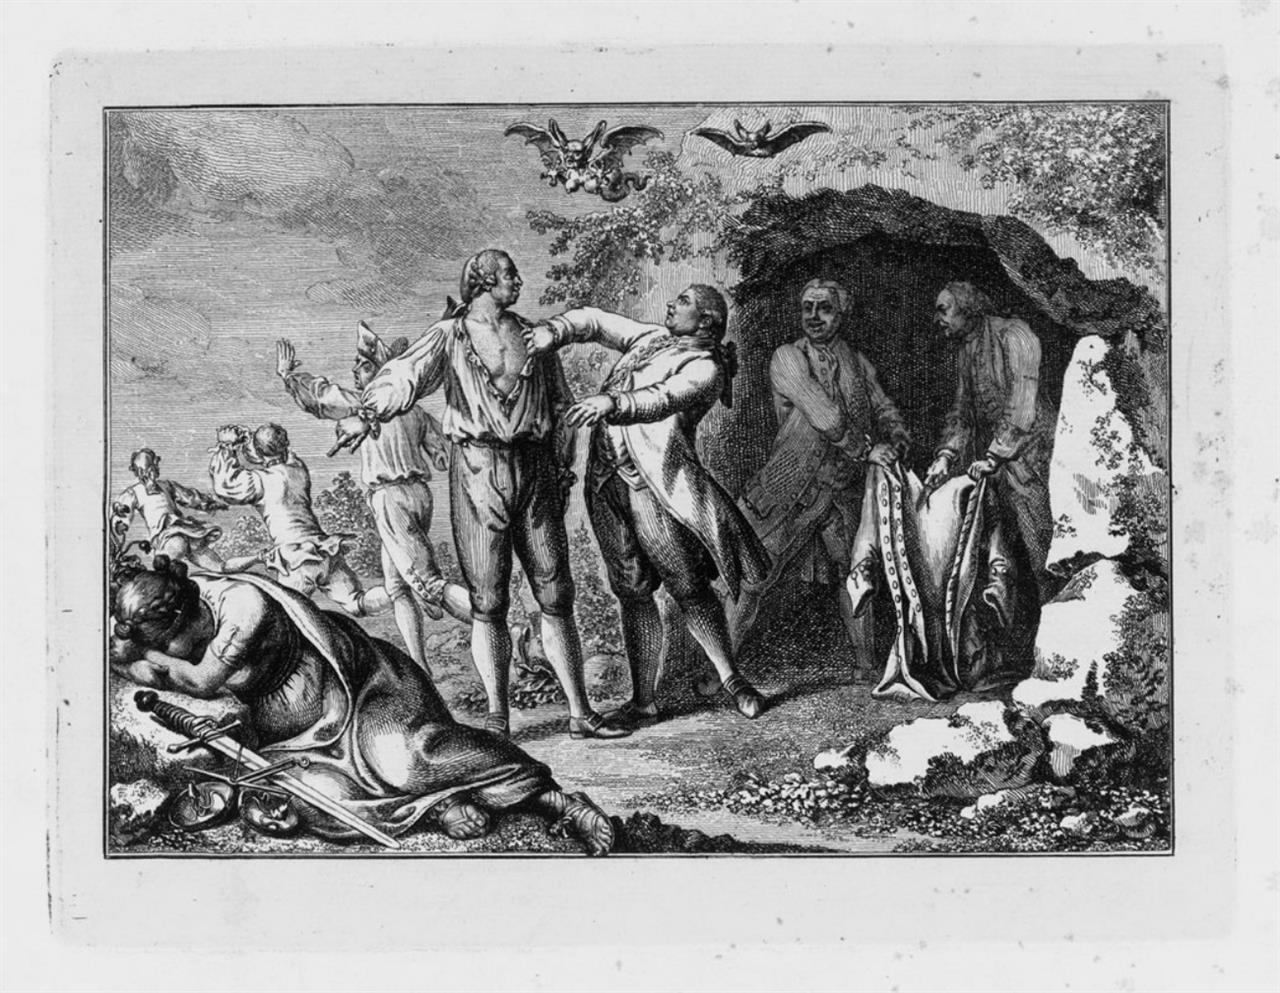 D. N. Chodowiecki. Die Werke der Finsternis. 1781. Radierung.